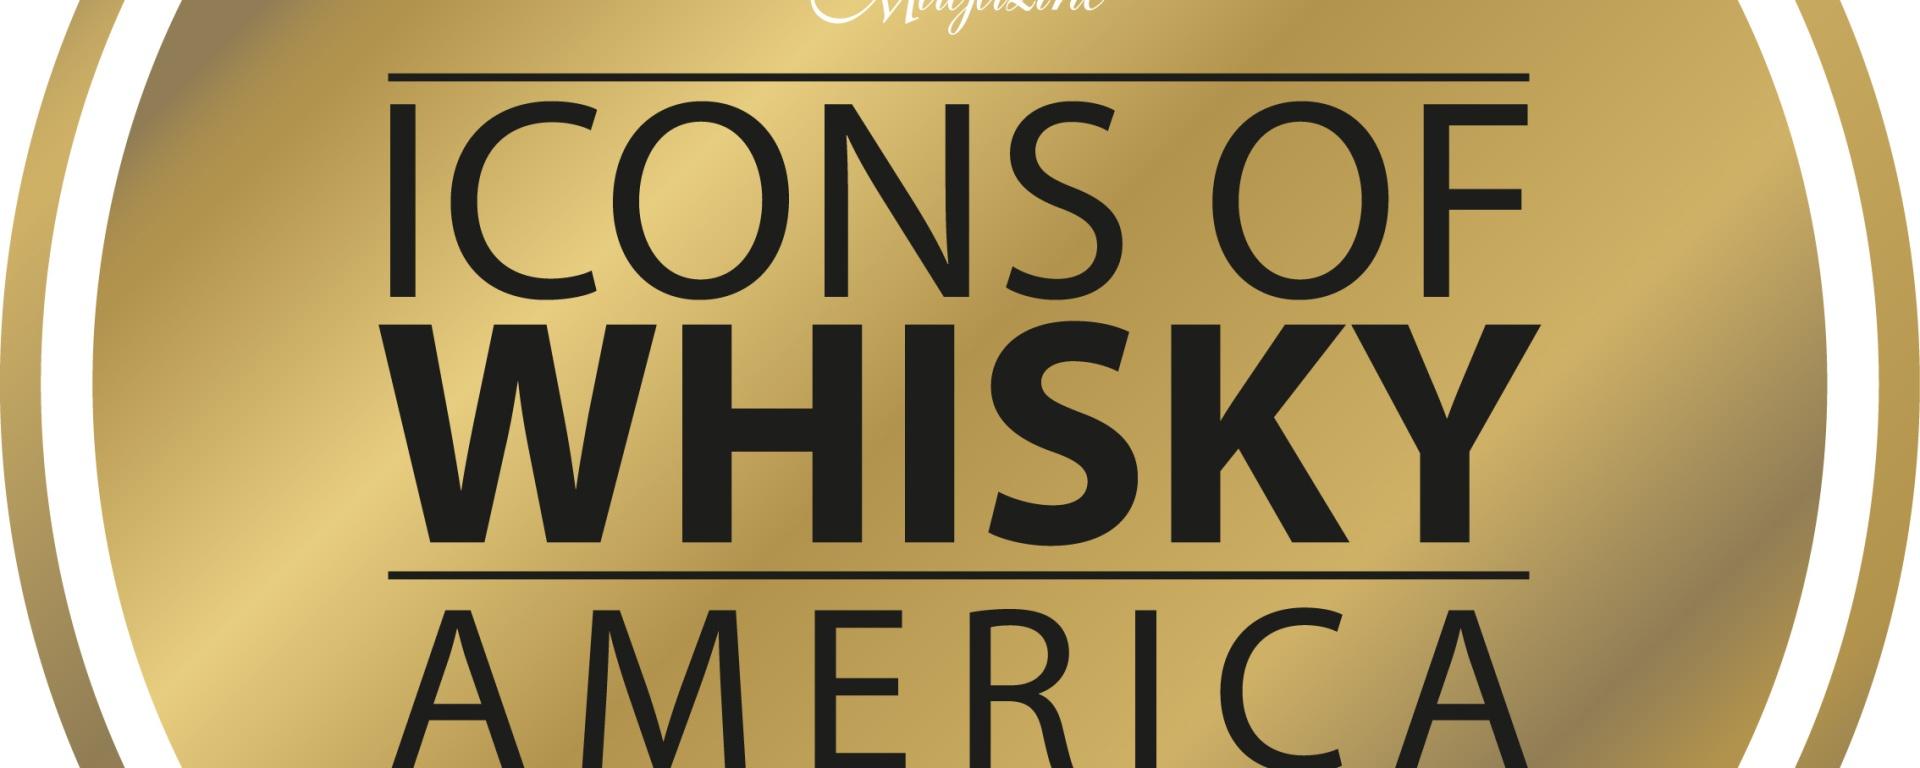 Icons of Whisky America 2021 Logo